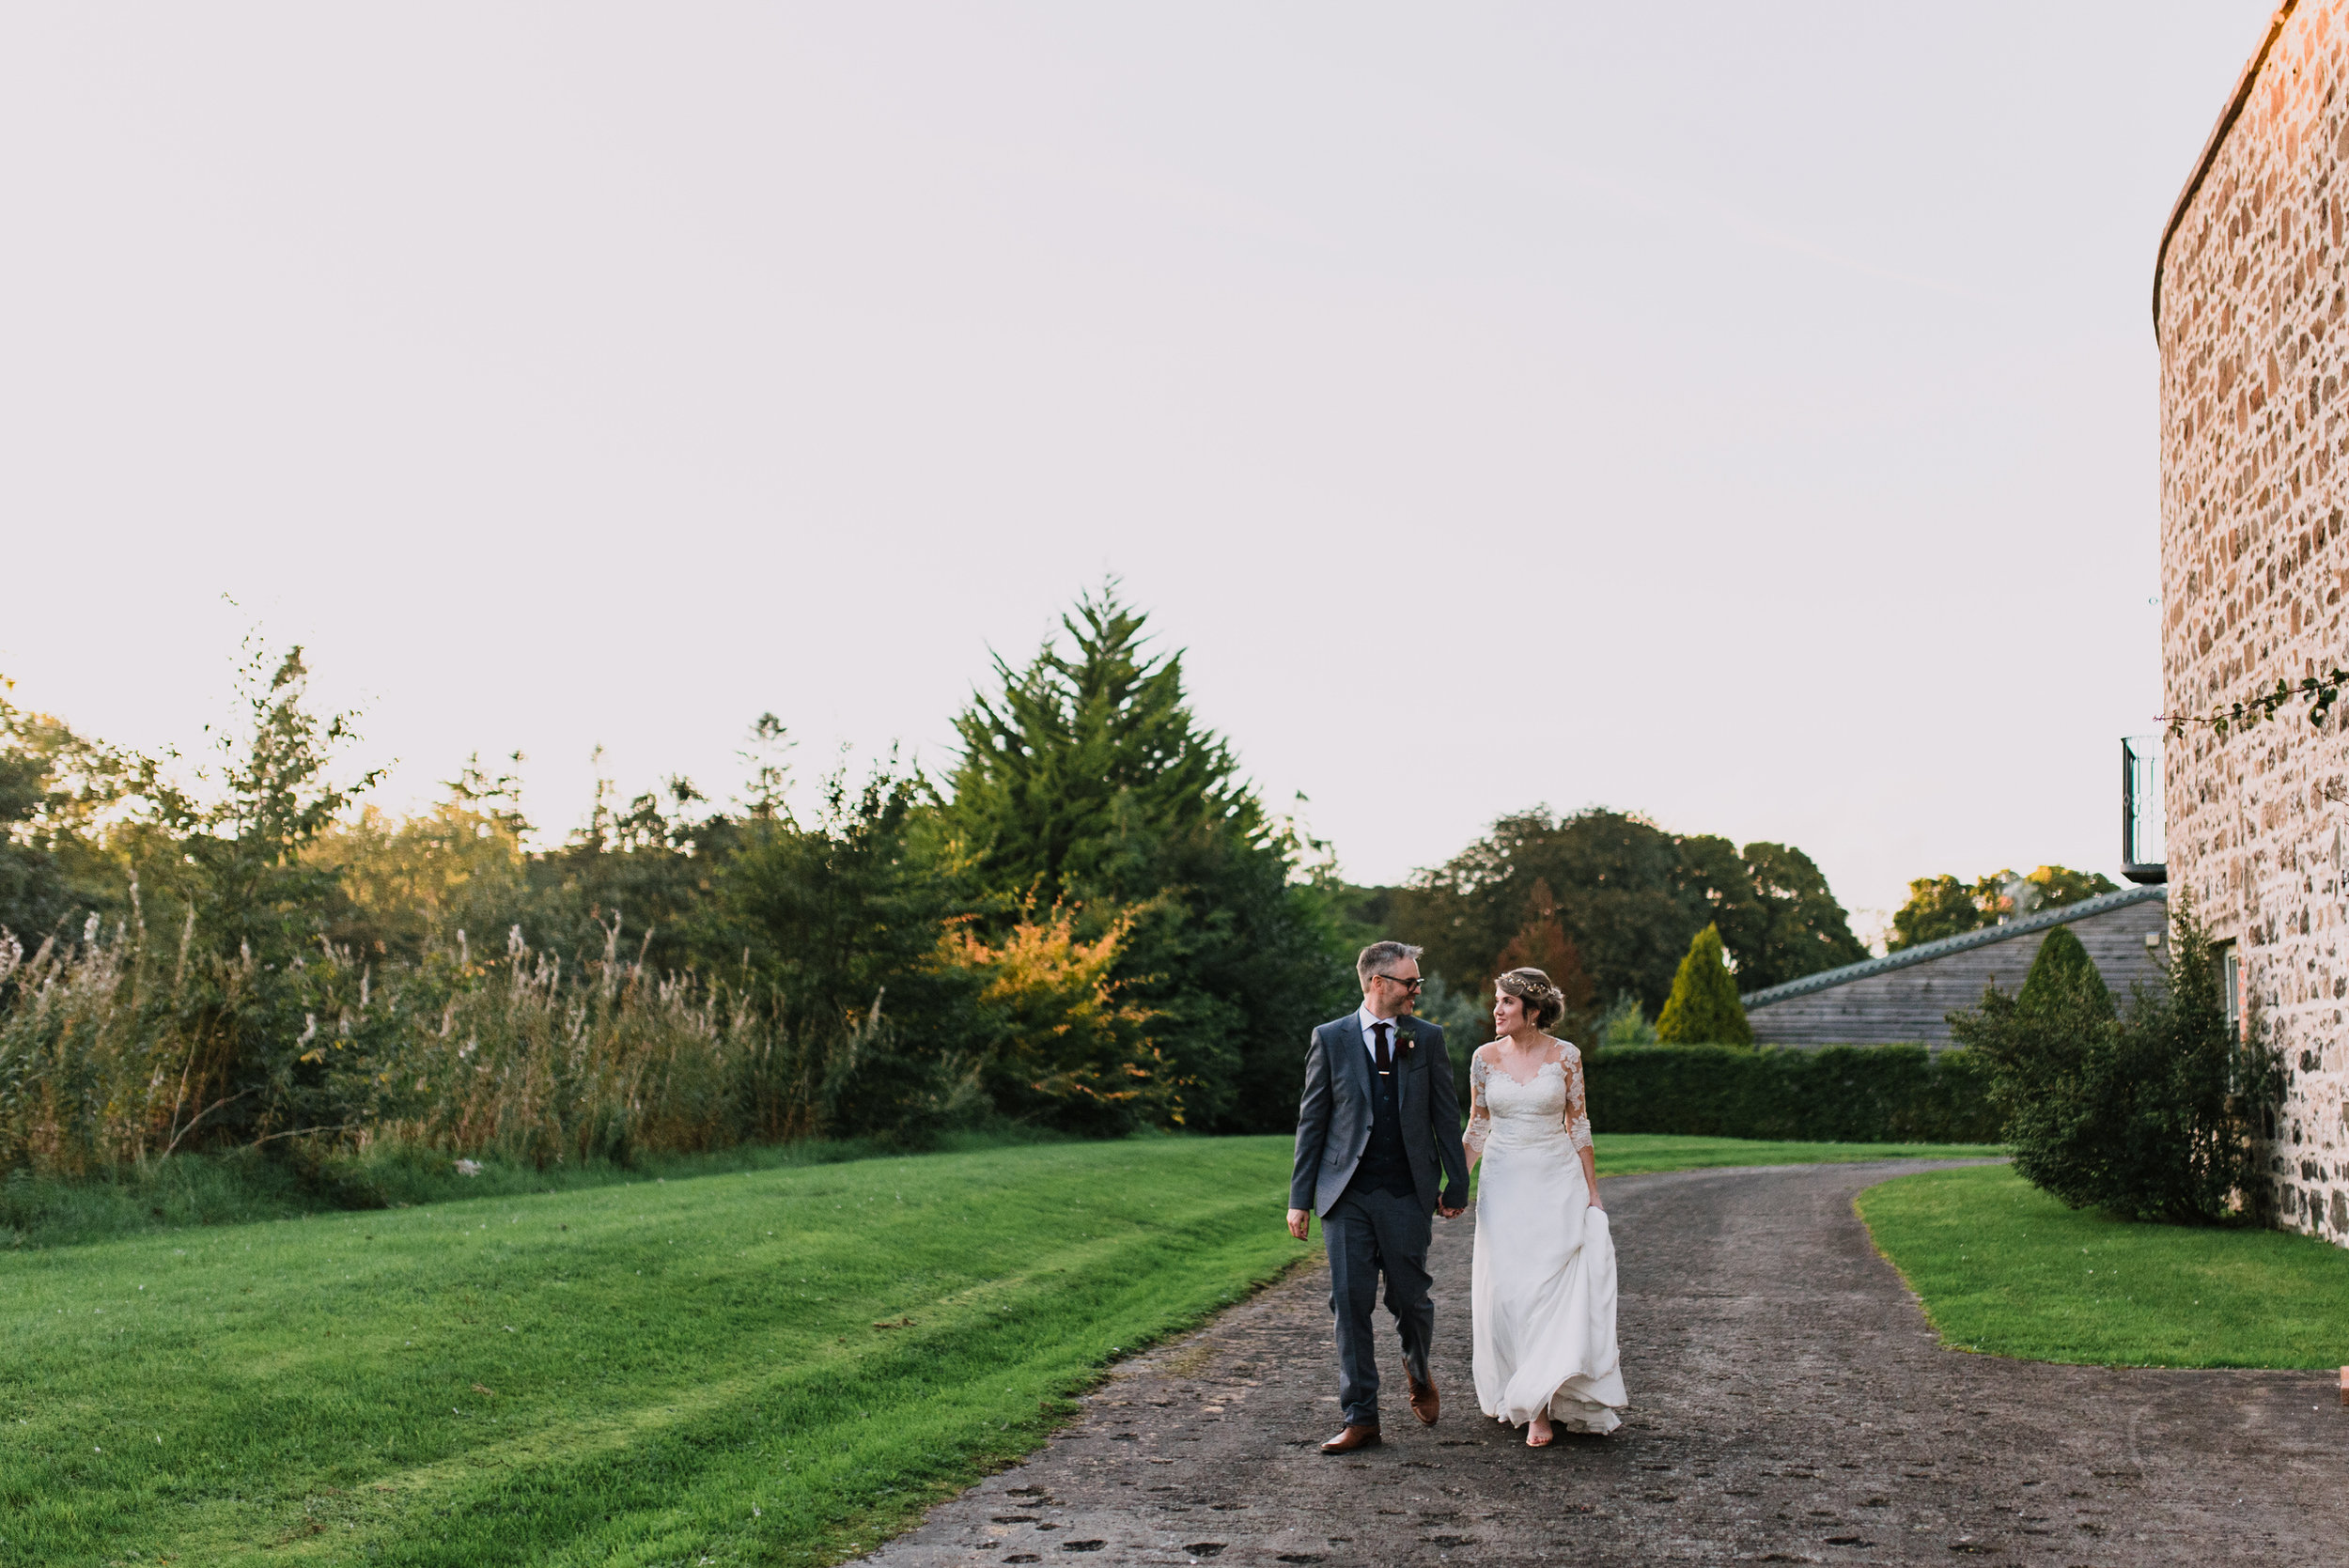 lissanoure castle wedding, northern ireland wedding photographer, romantic northern irish wedding venue, castle wedding ireland, natural wedding photography ni (119).jpg